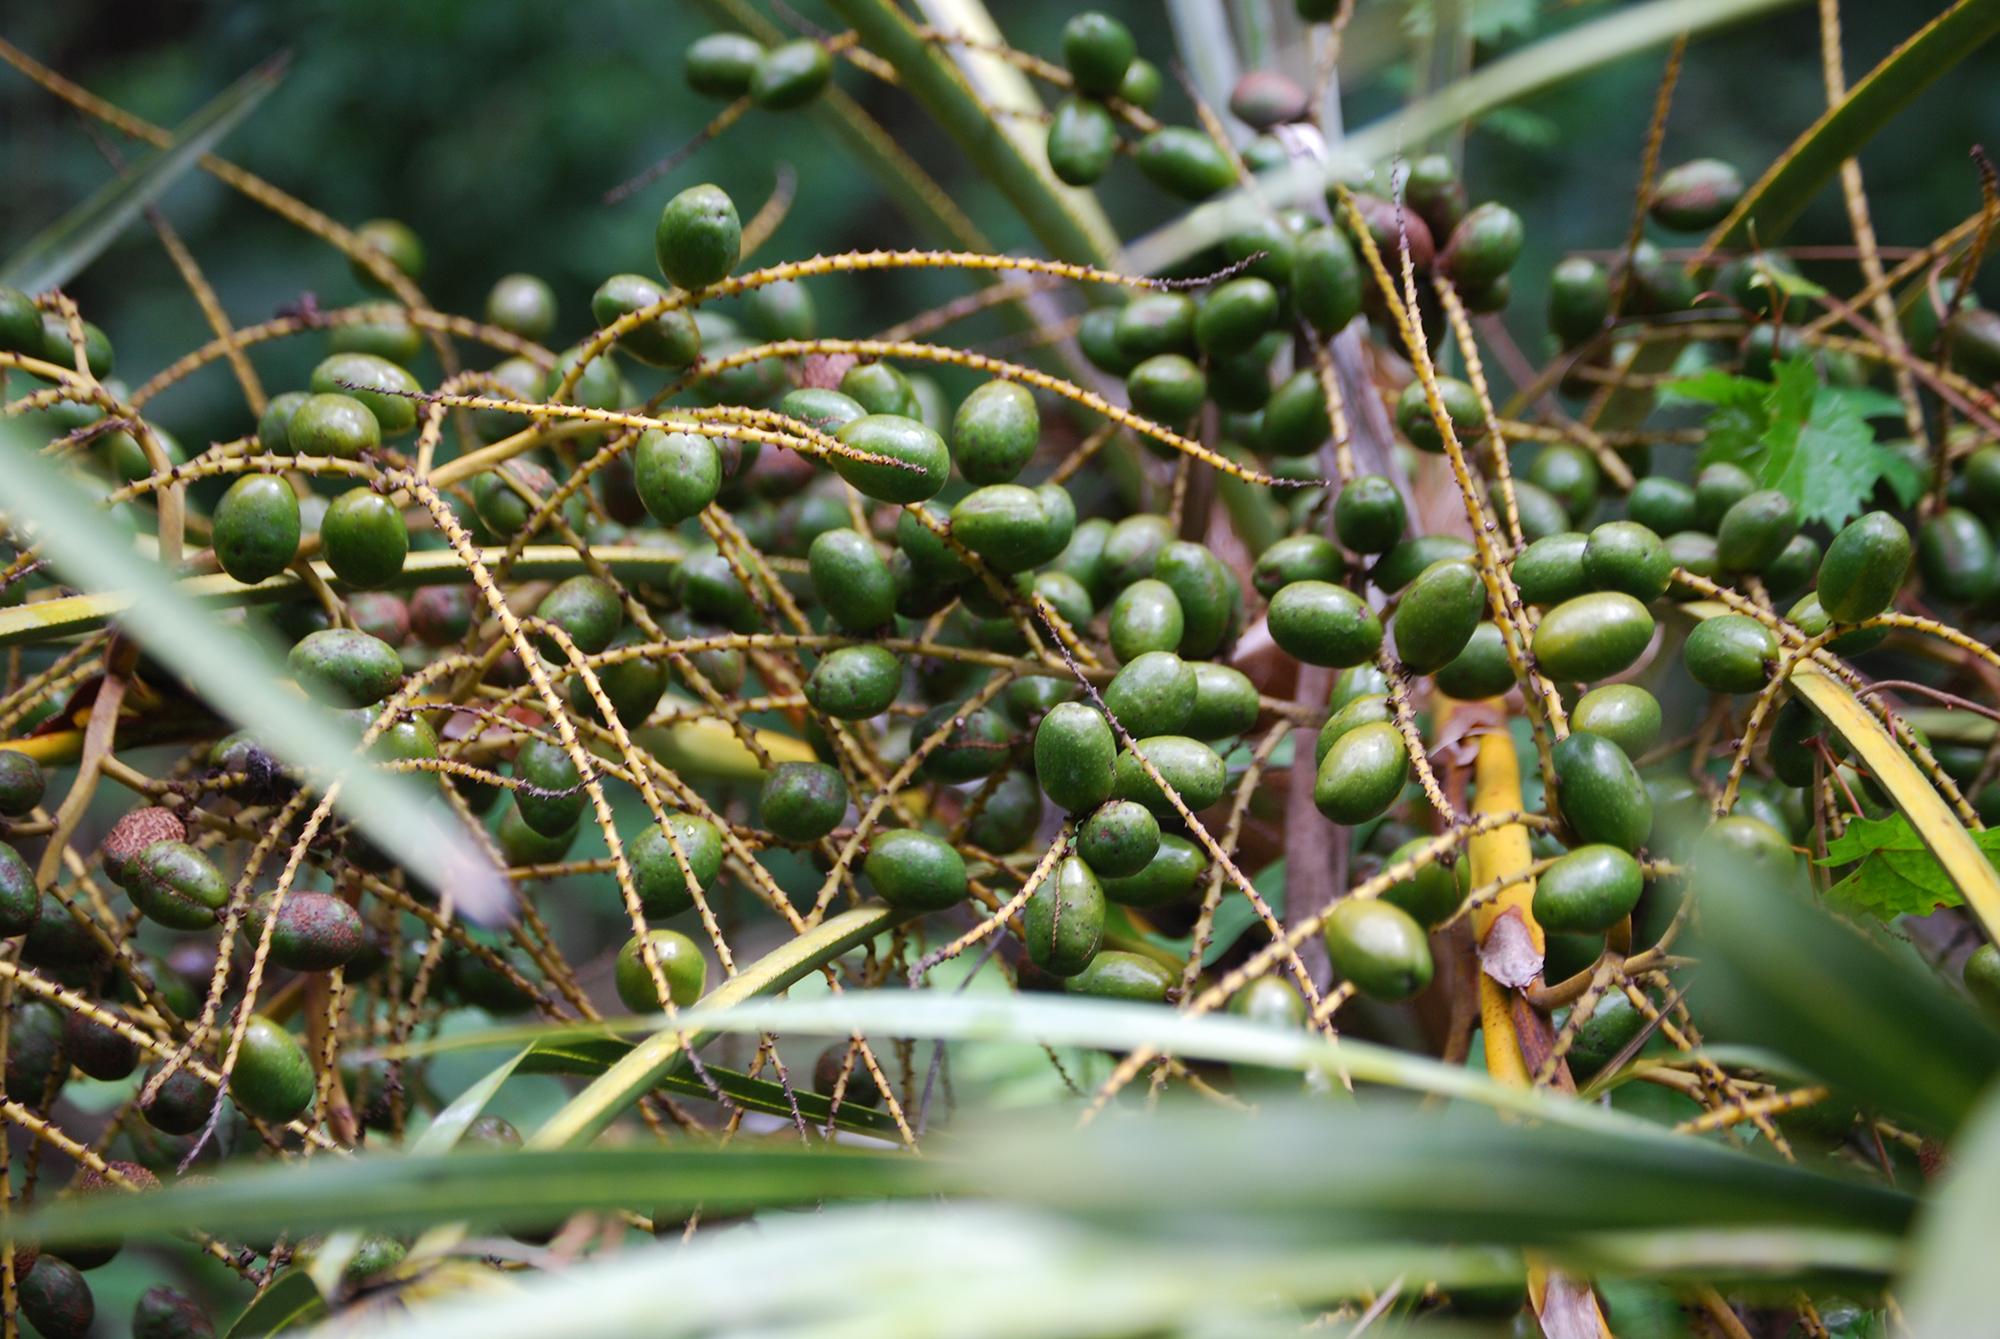 Saw palmetto berries.